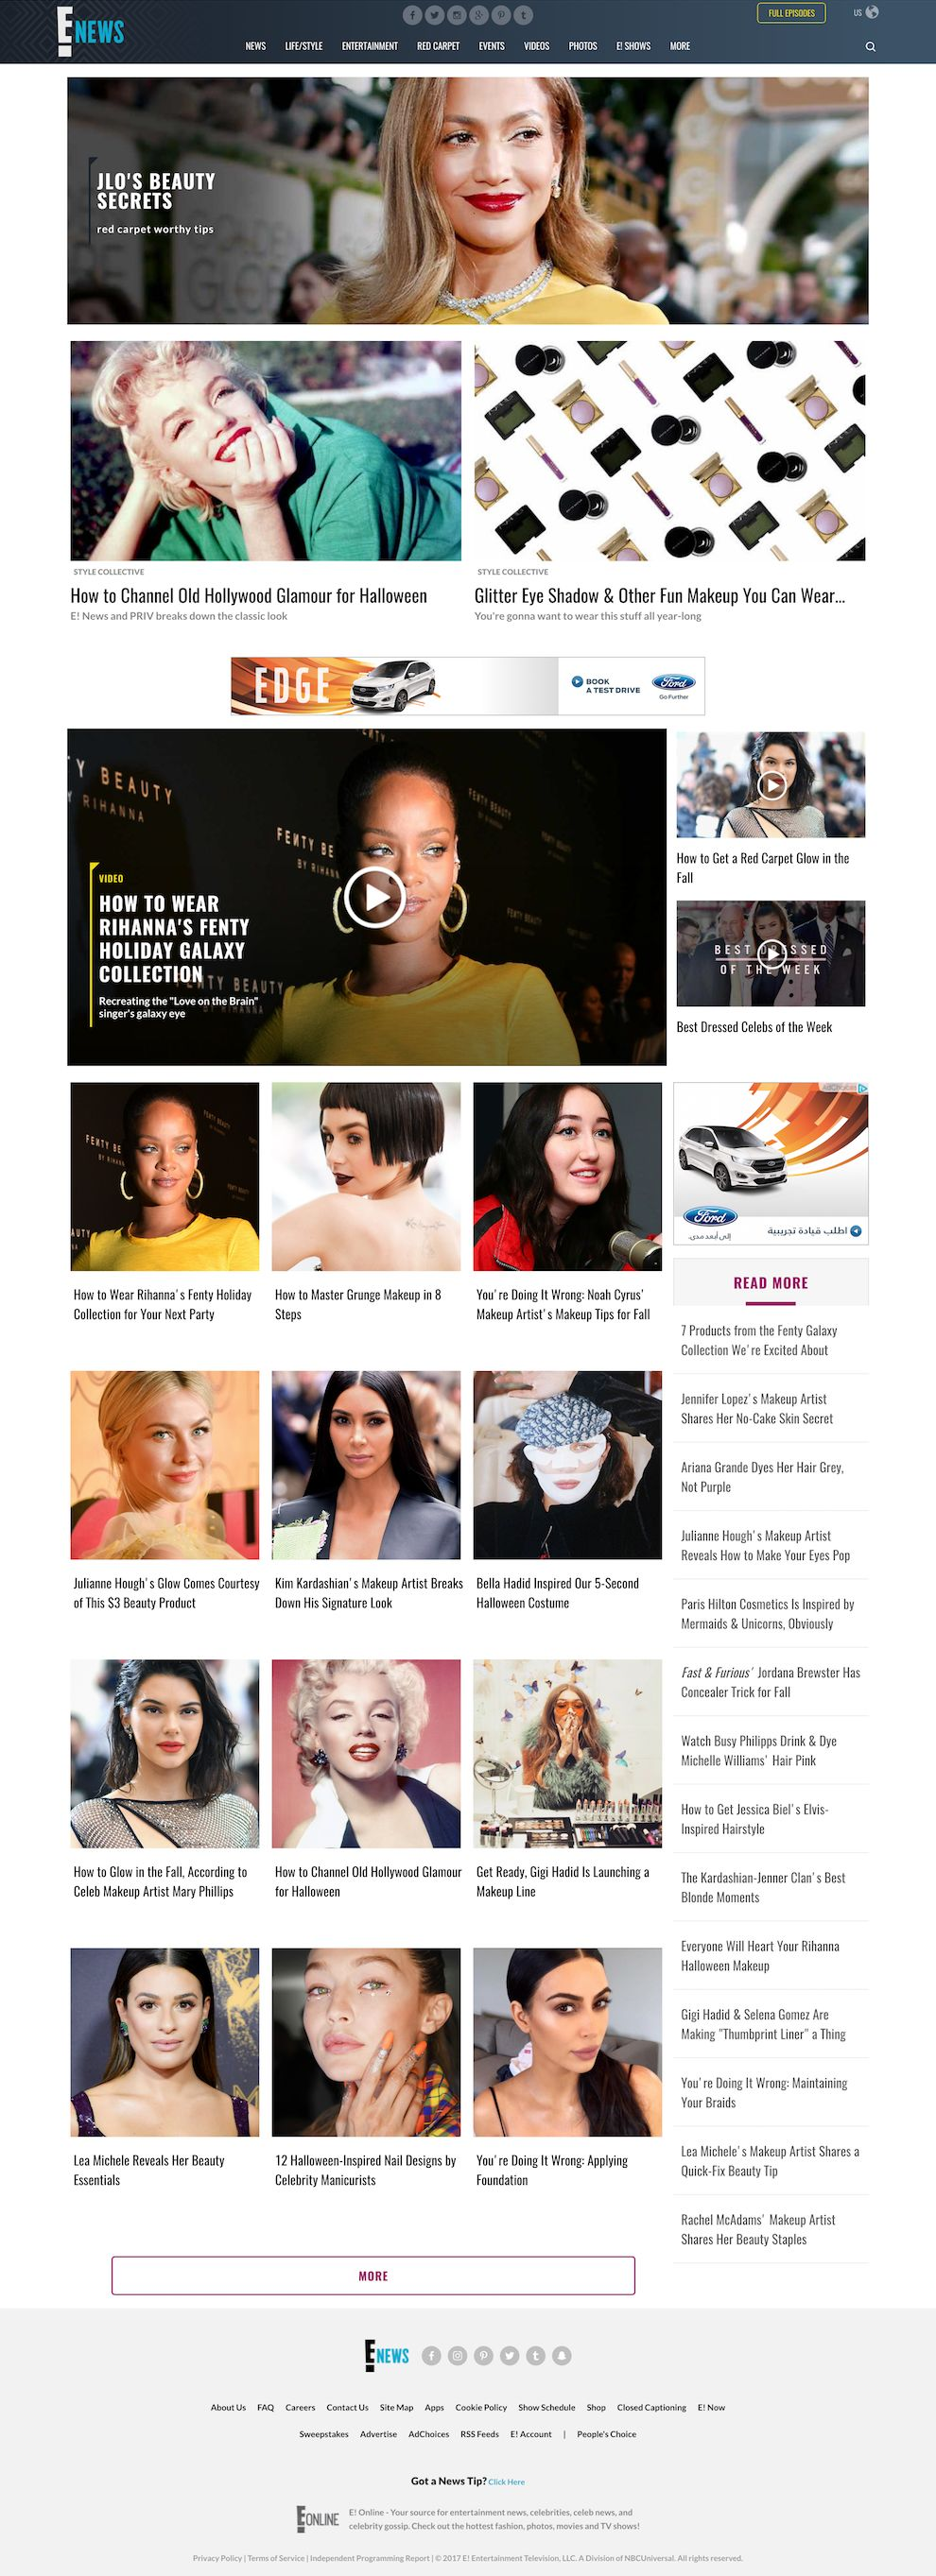 E Online Clean Website Design